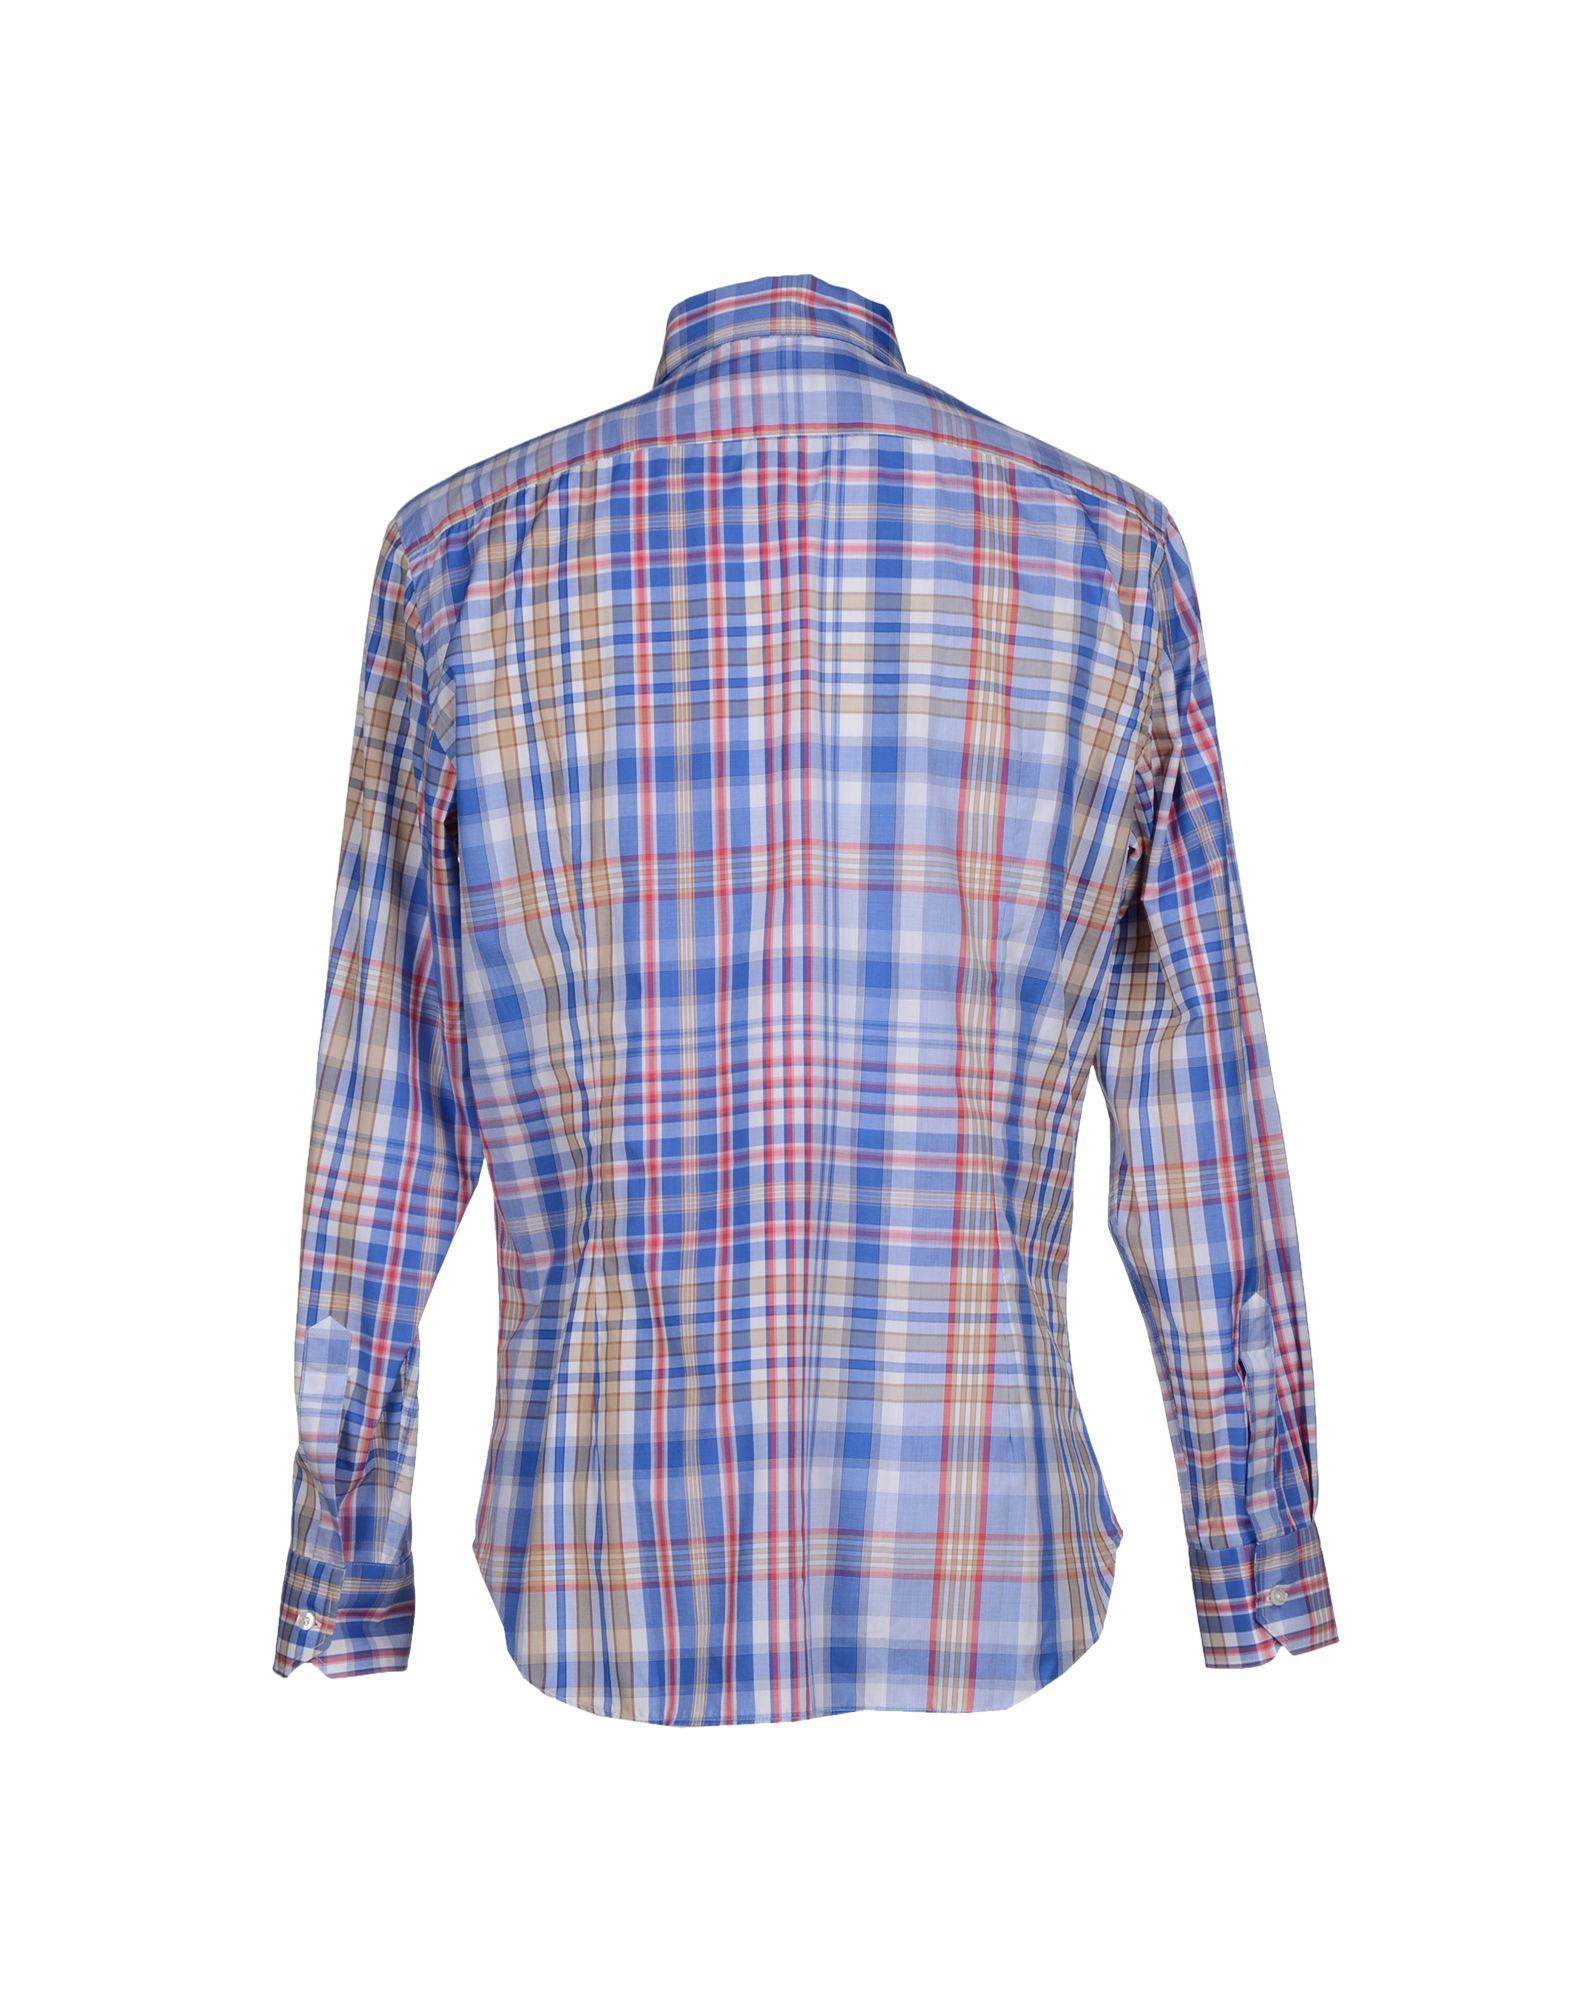 Lyst Etro Shirt In Blue For Men